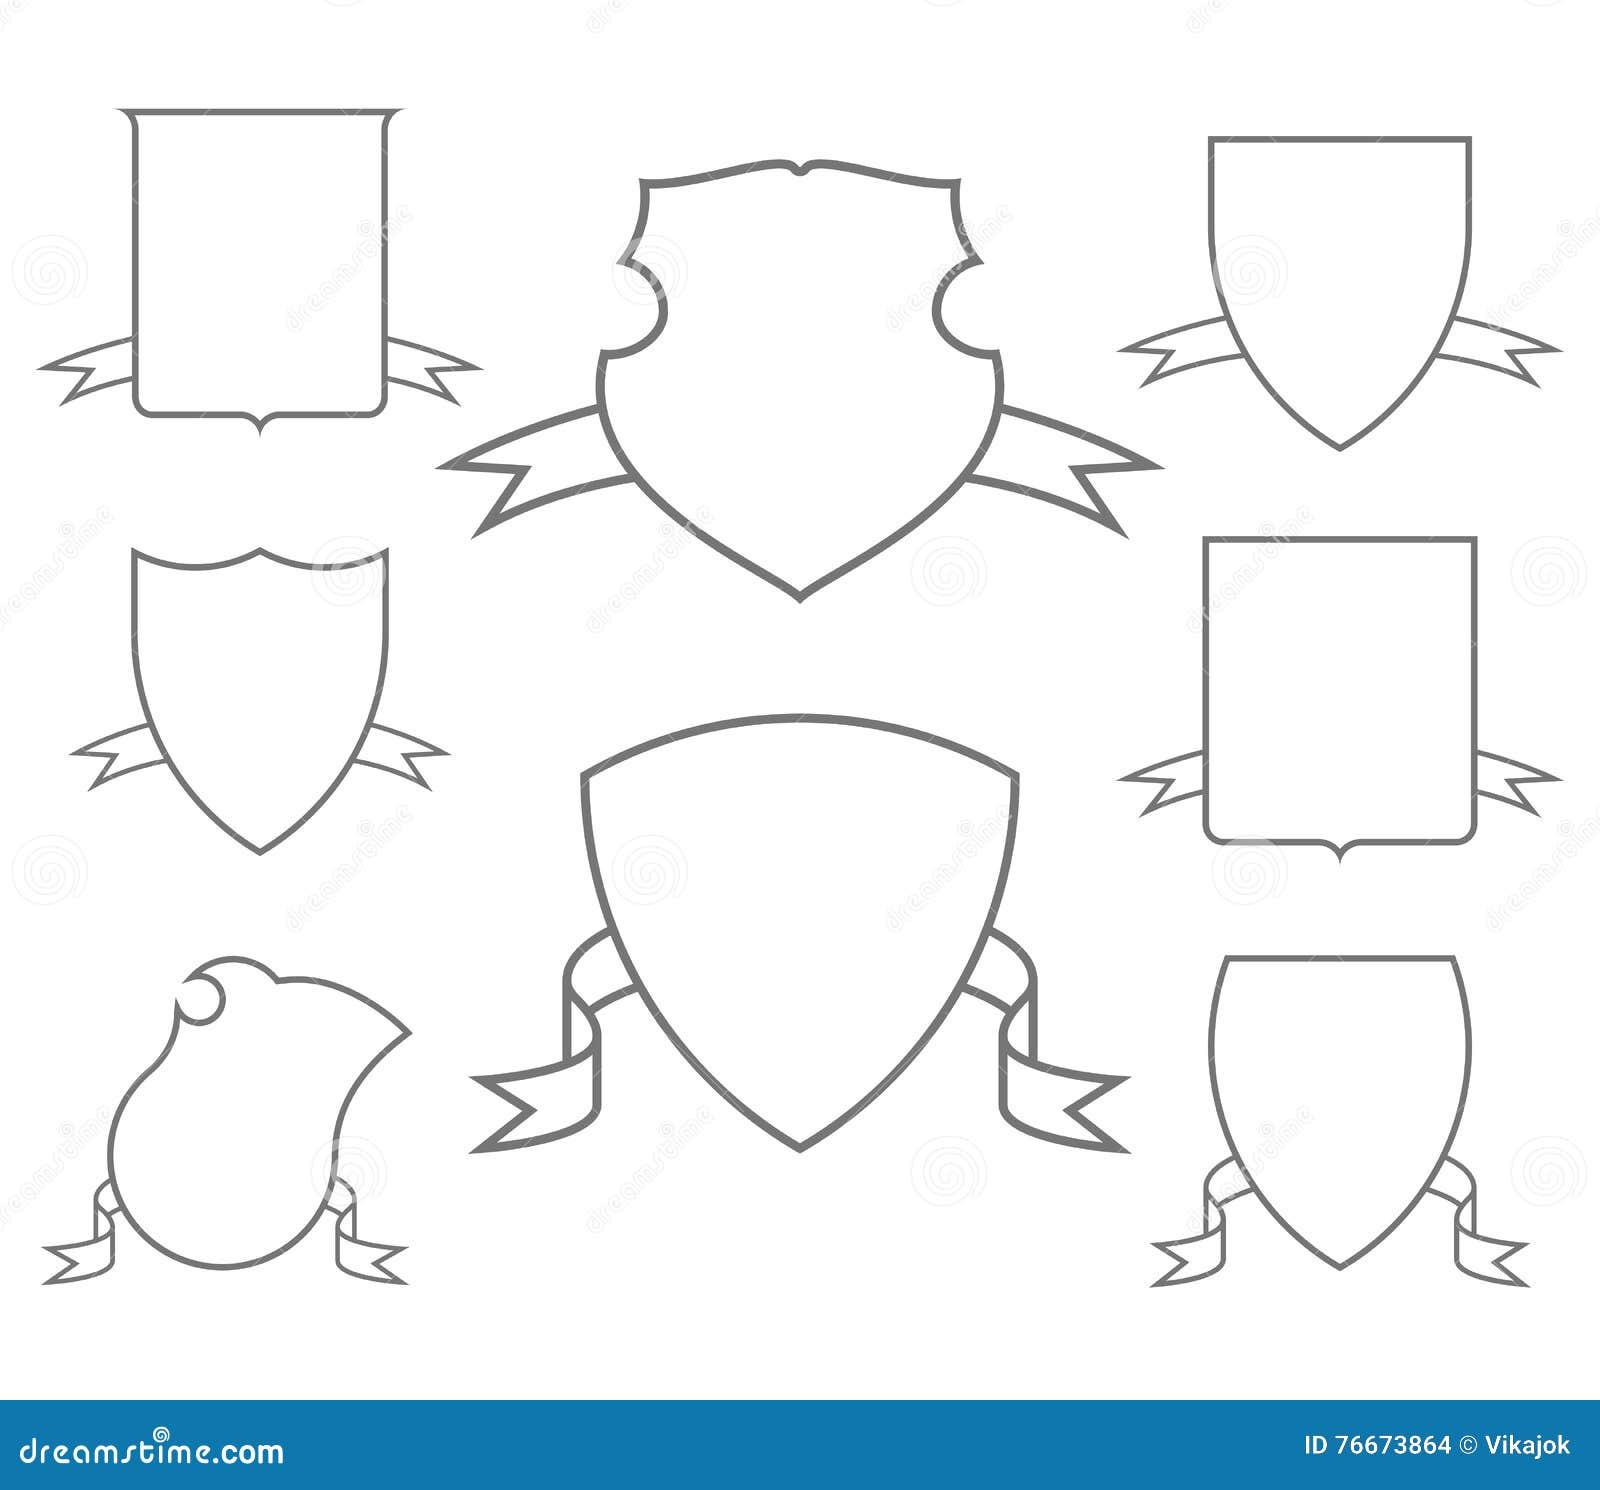 Shield outline coat arms clipart panda free clipart images - Shield Outline Coat Arms Clipart Panda Free Clipart Images Blank Shield Clipart Clipart Panda Free